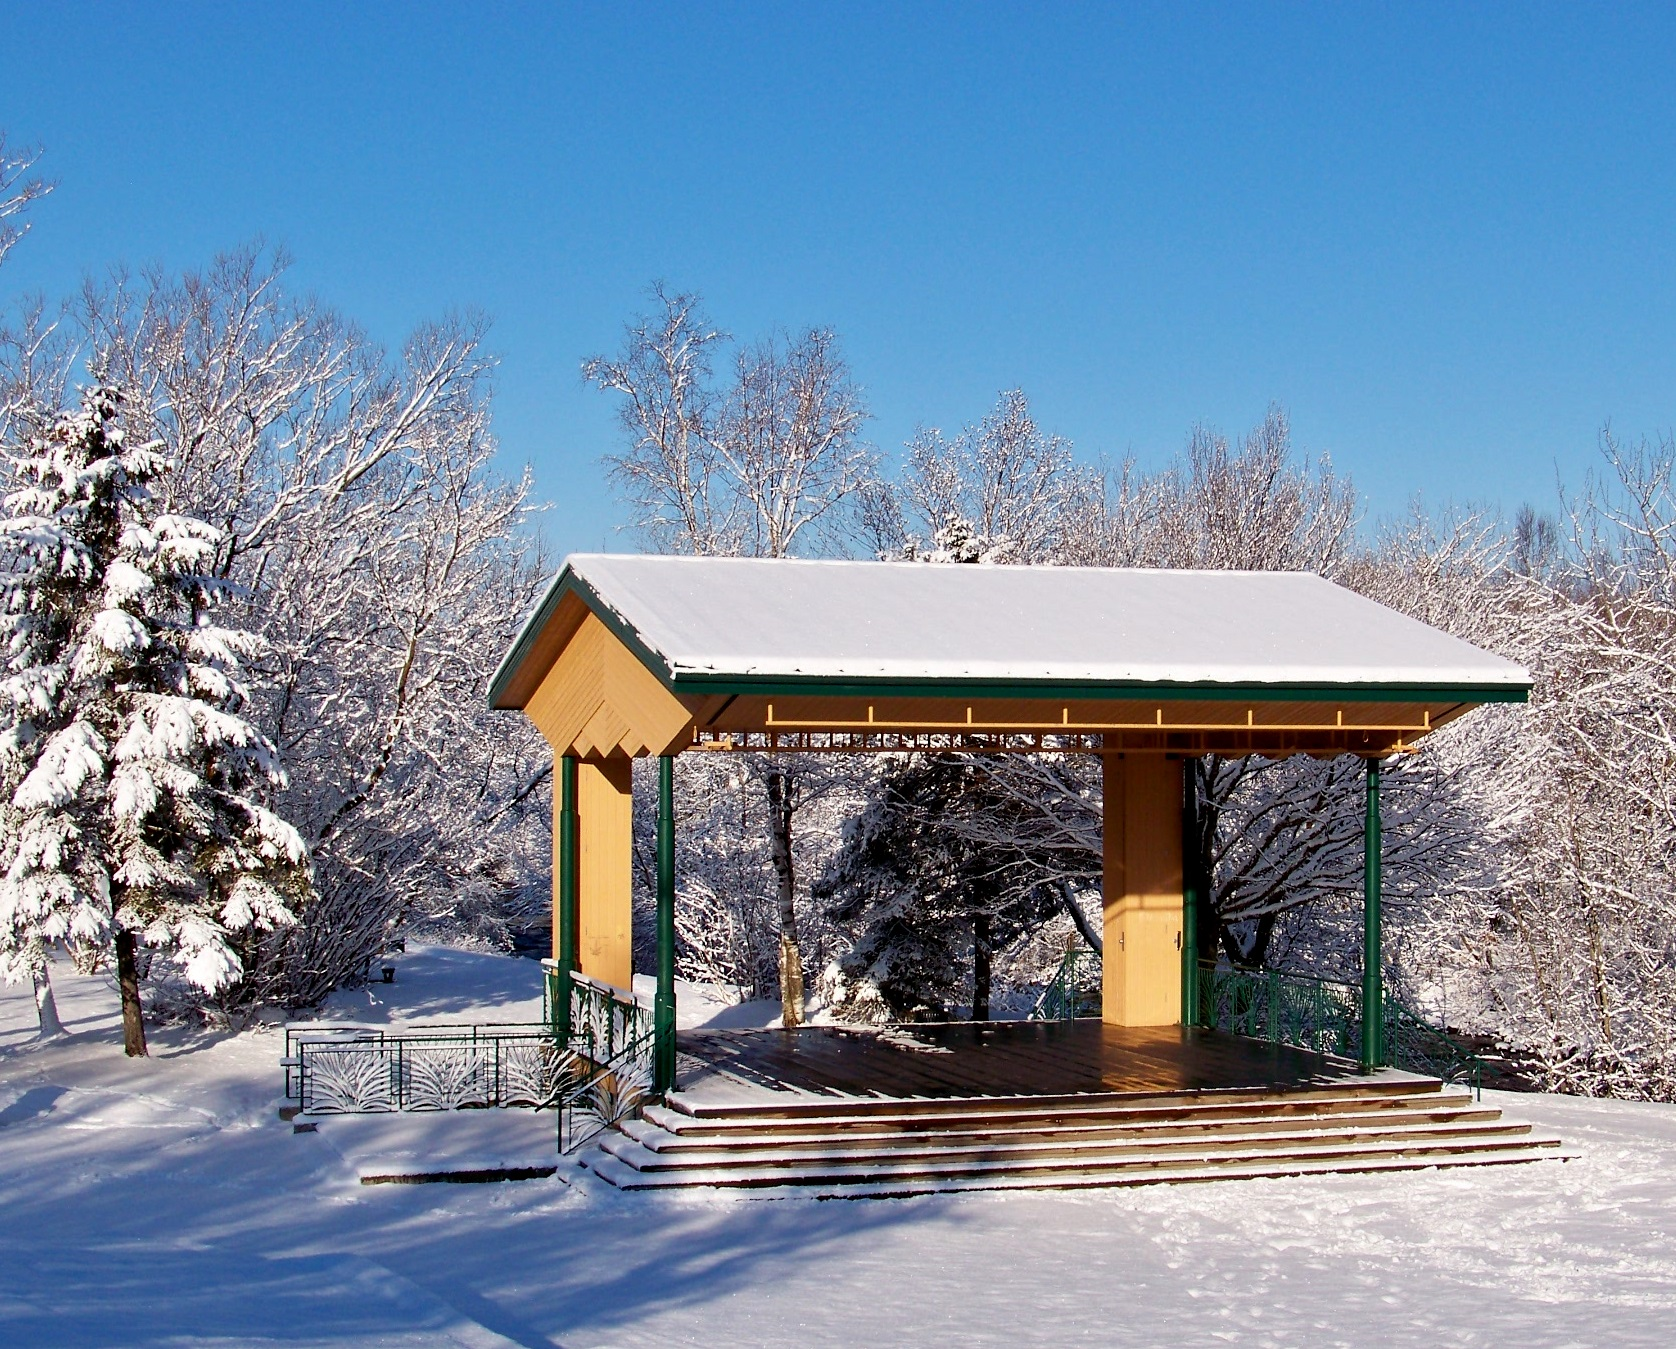 Winterland Kiosk Stock by philippeL